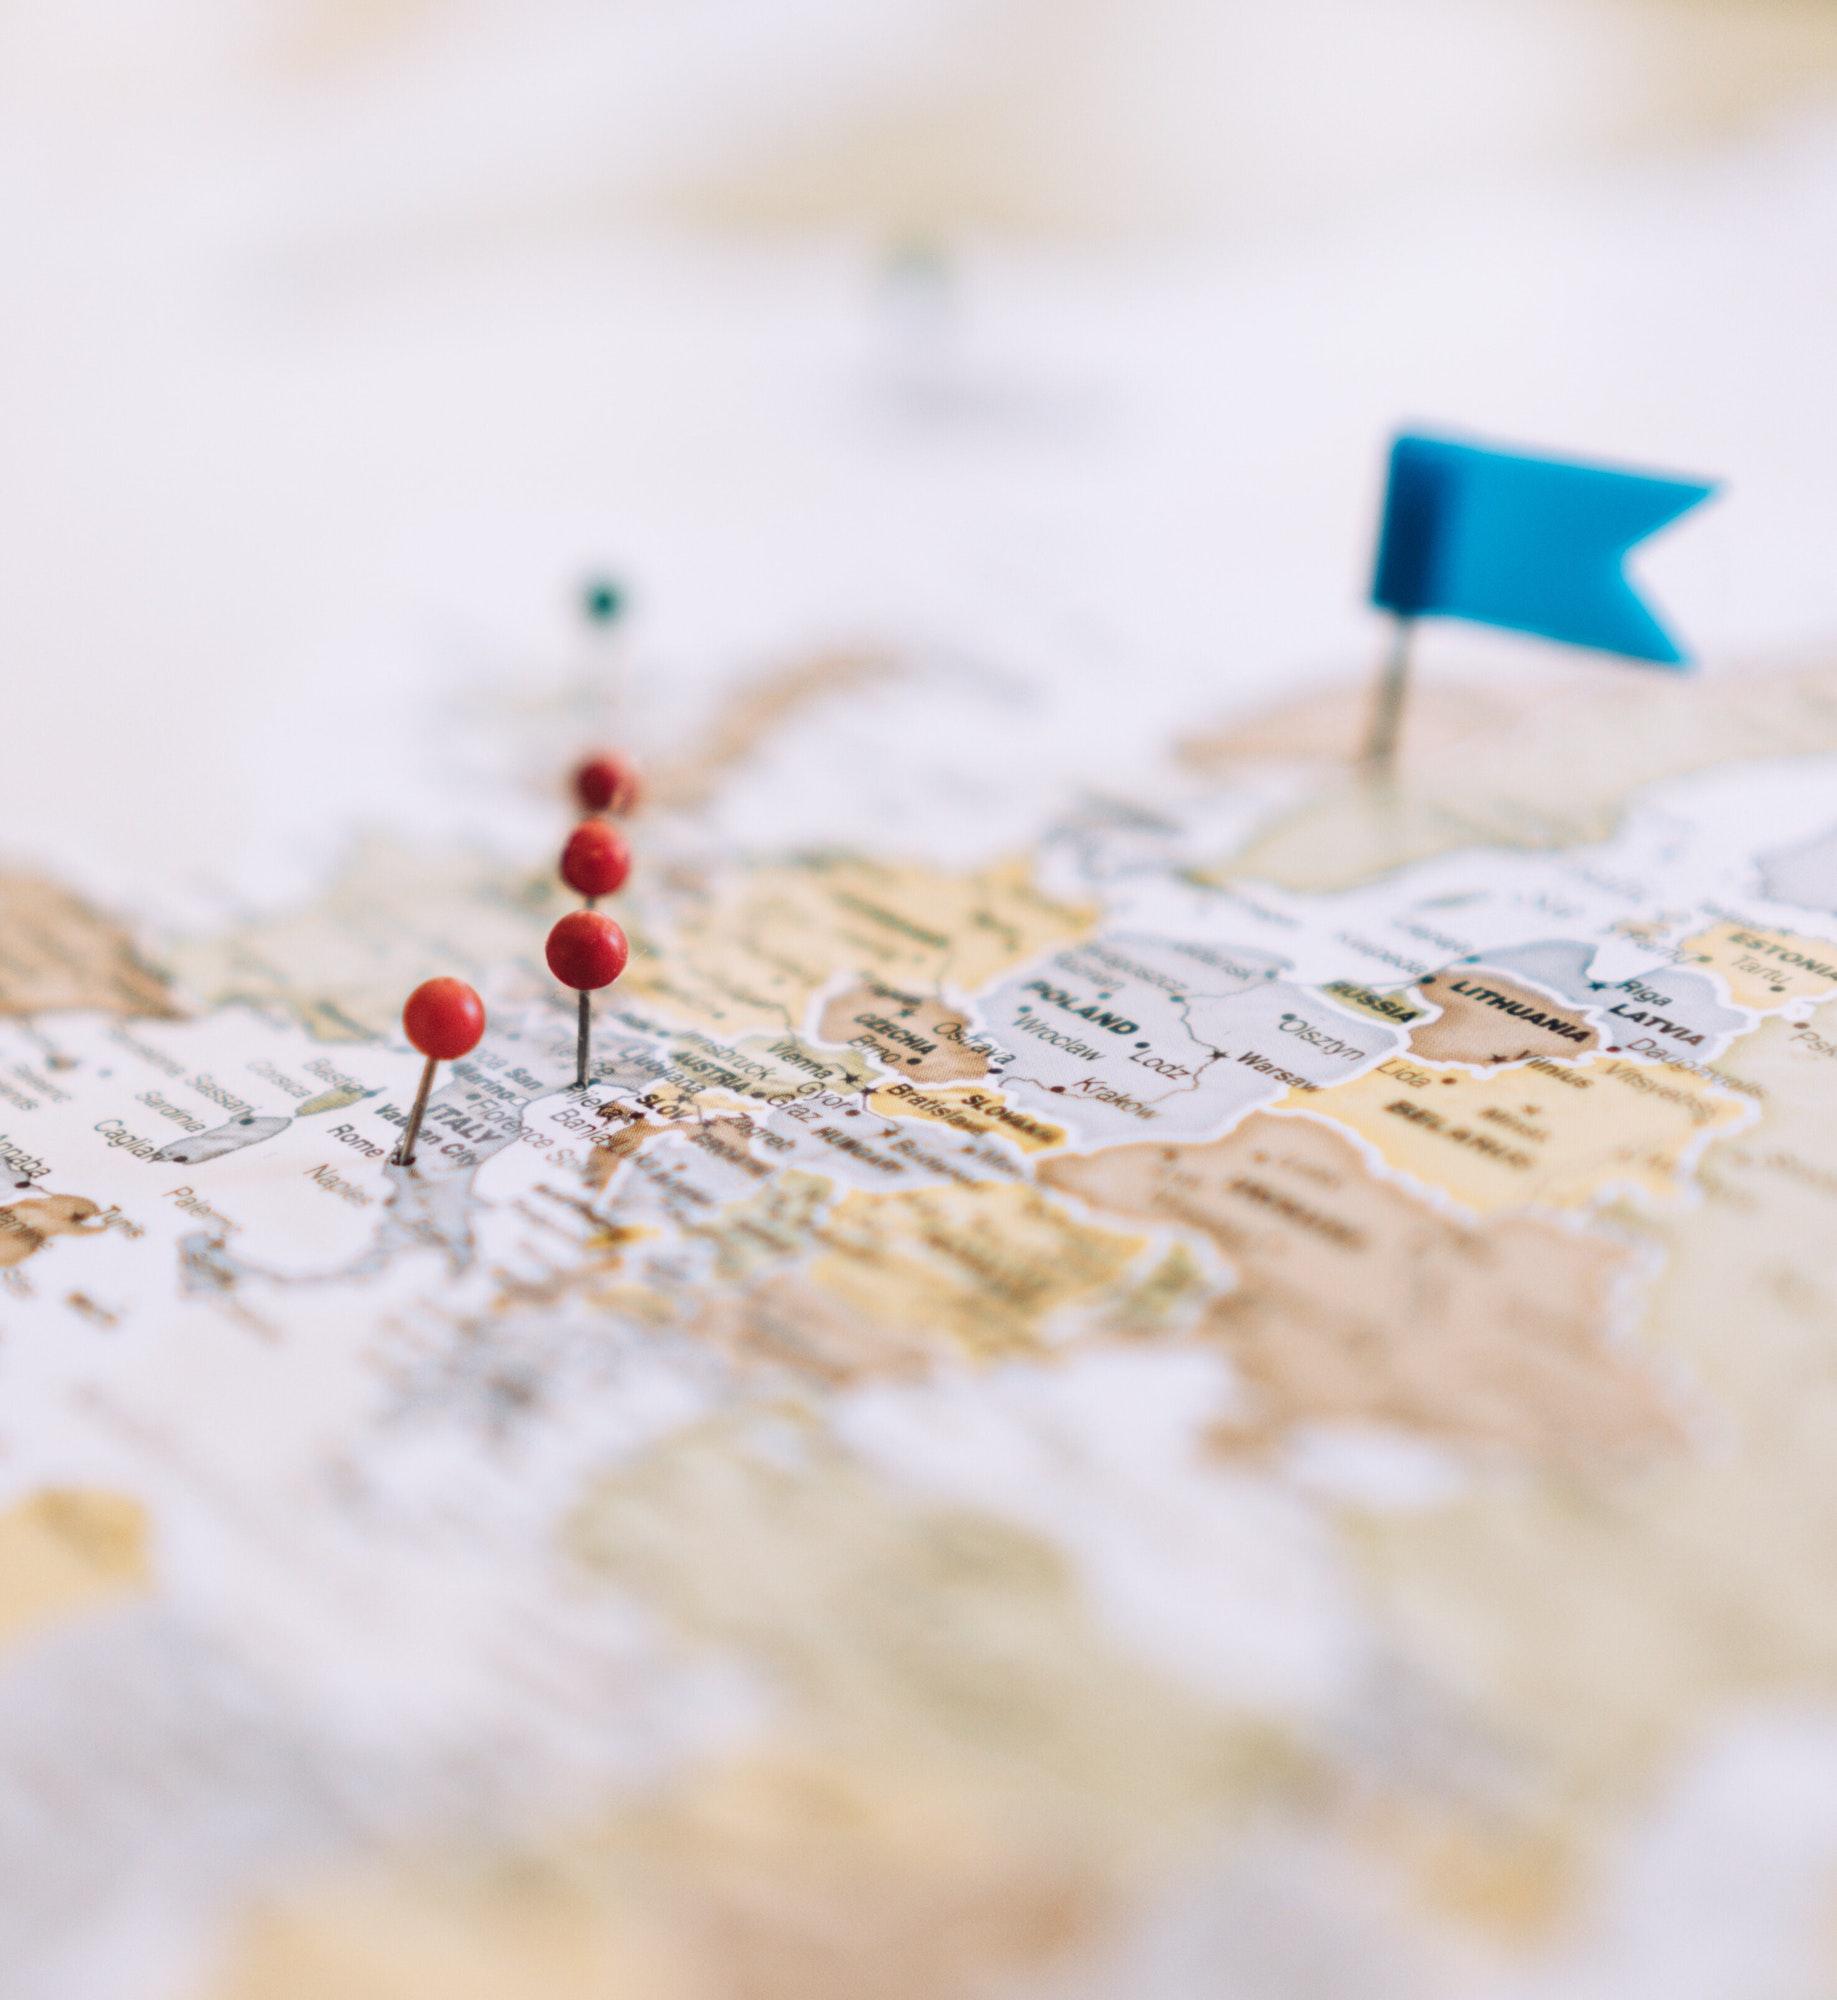 Travel destinations on map